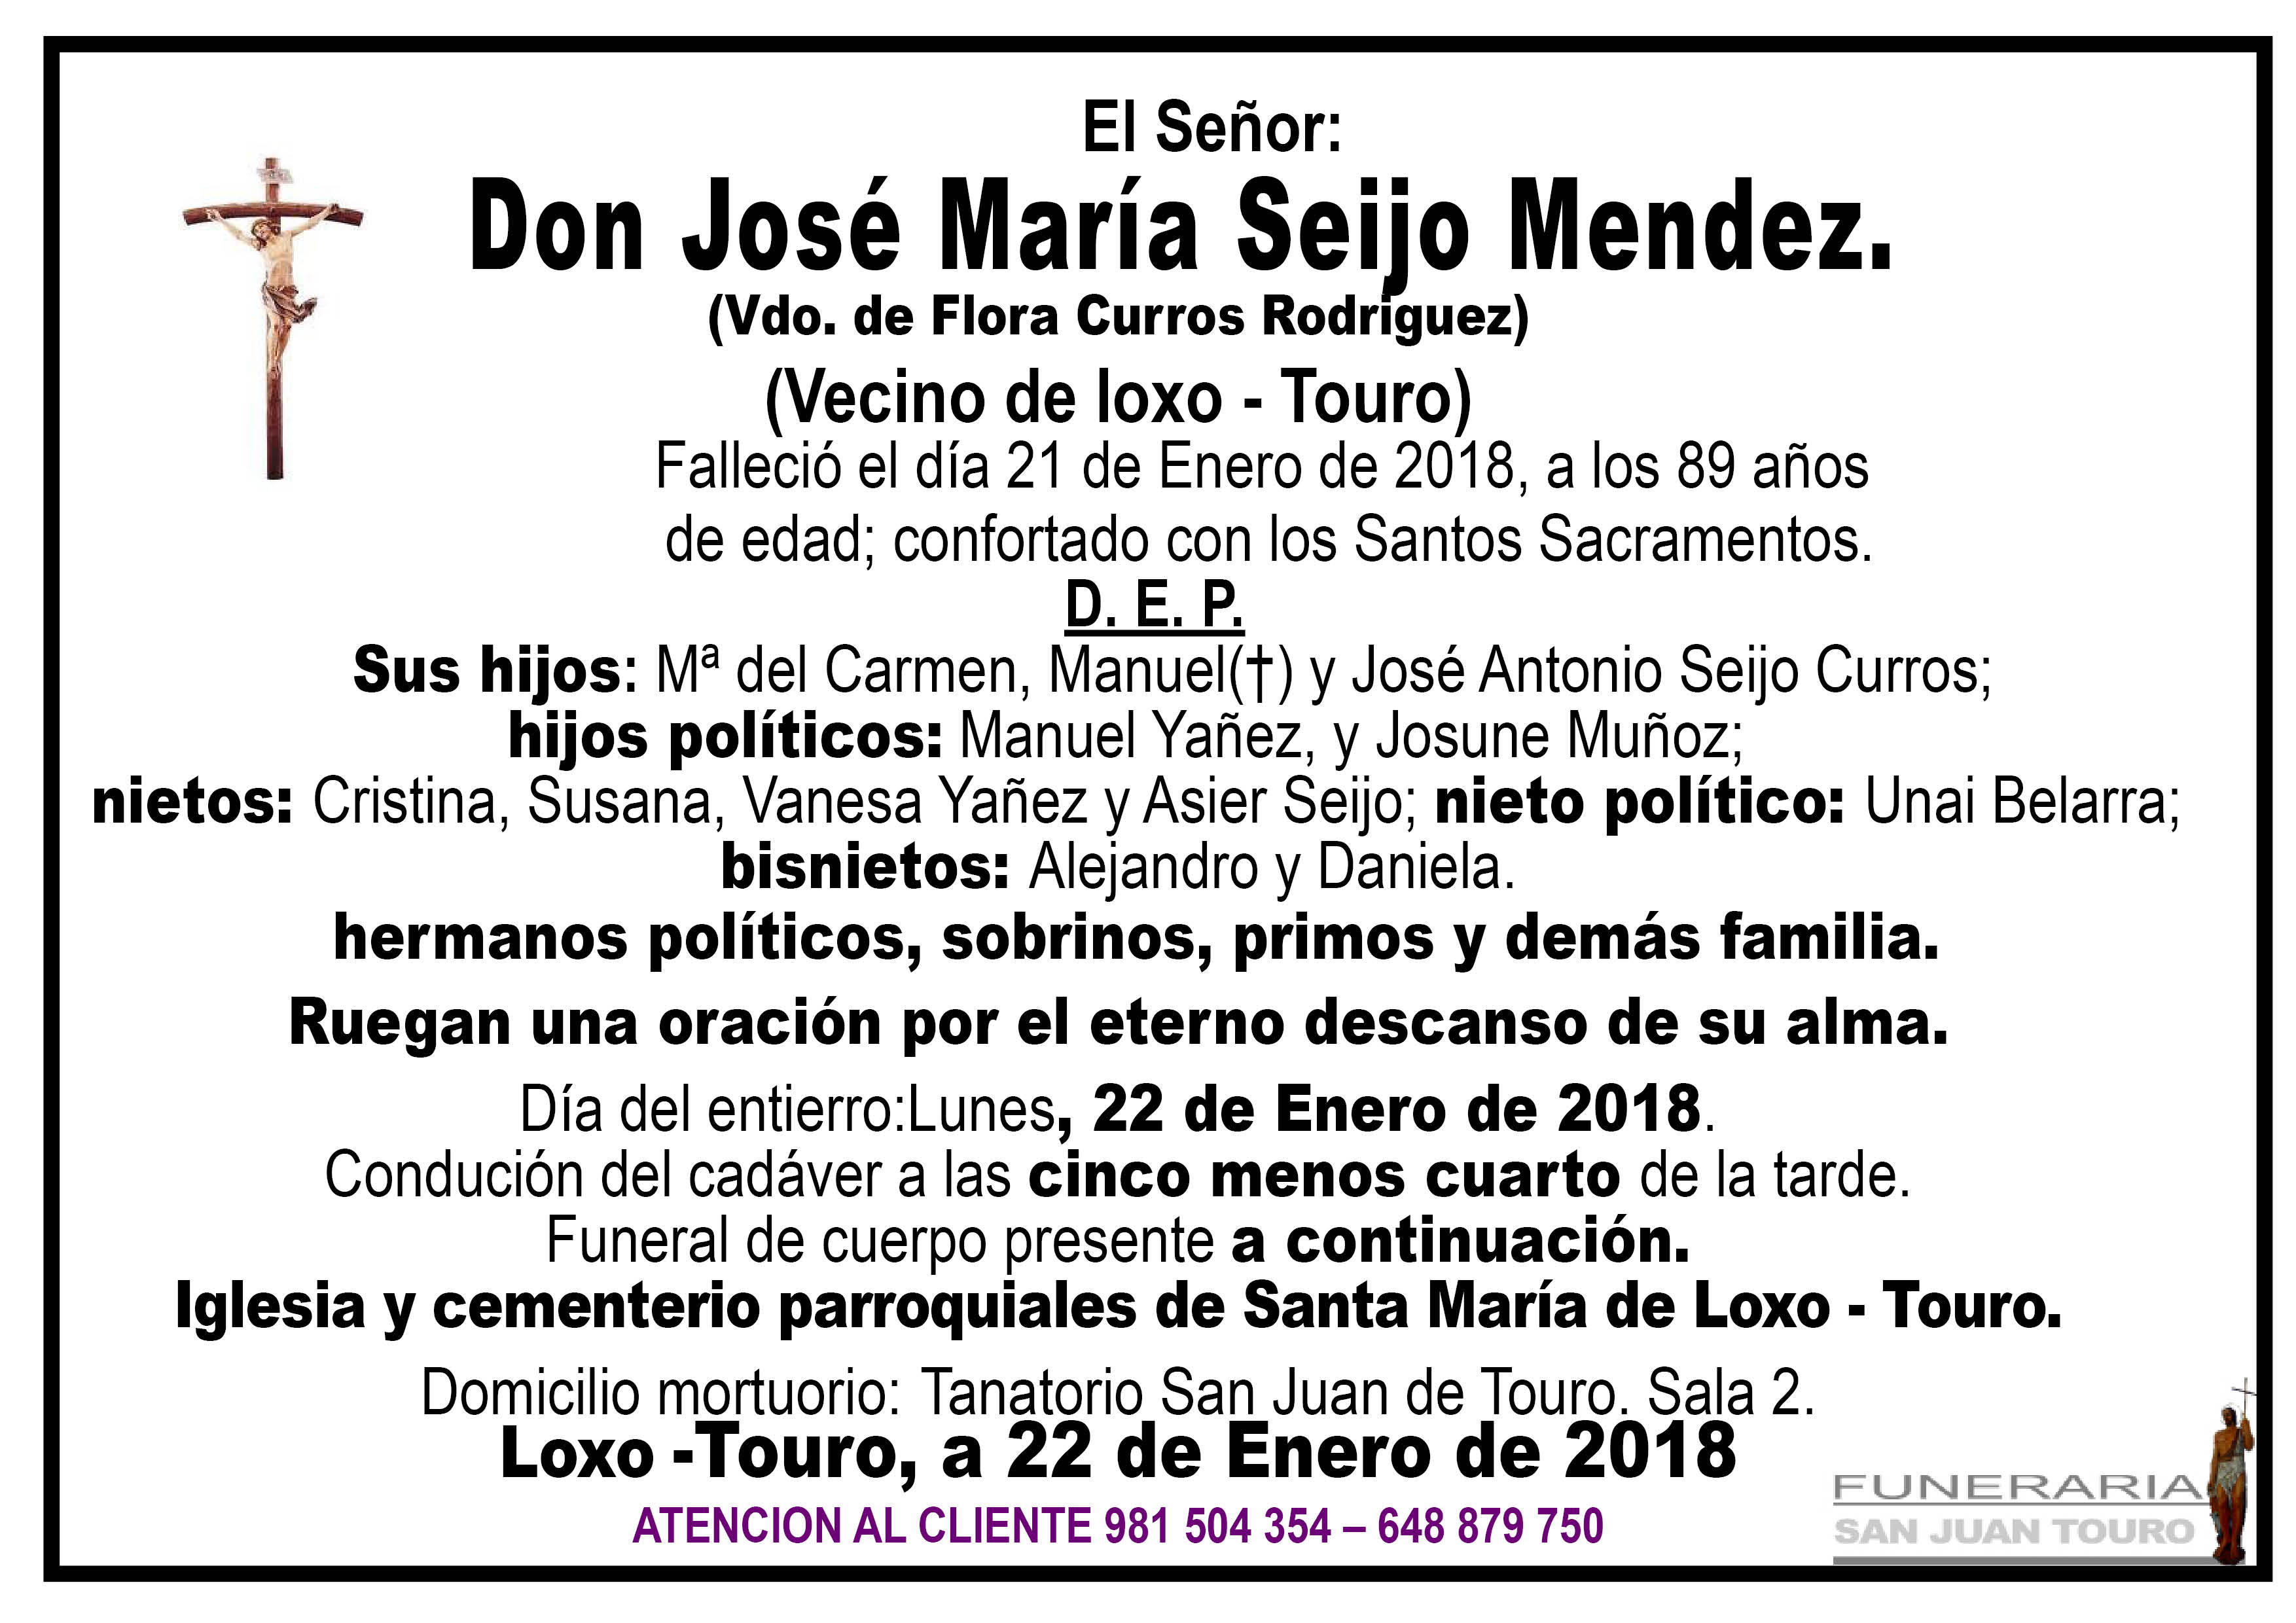 Esquela de SEPELIO DE D. JOSE MARIA SEIJO MENDEZ